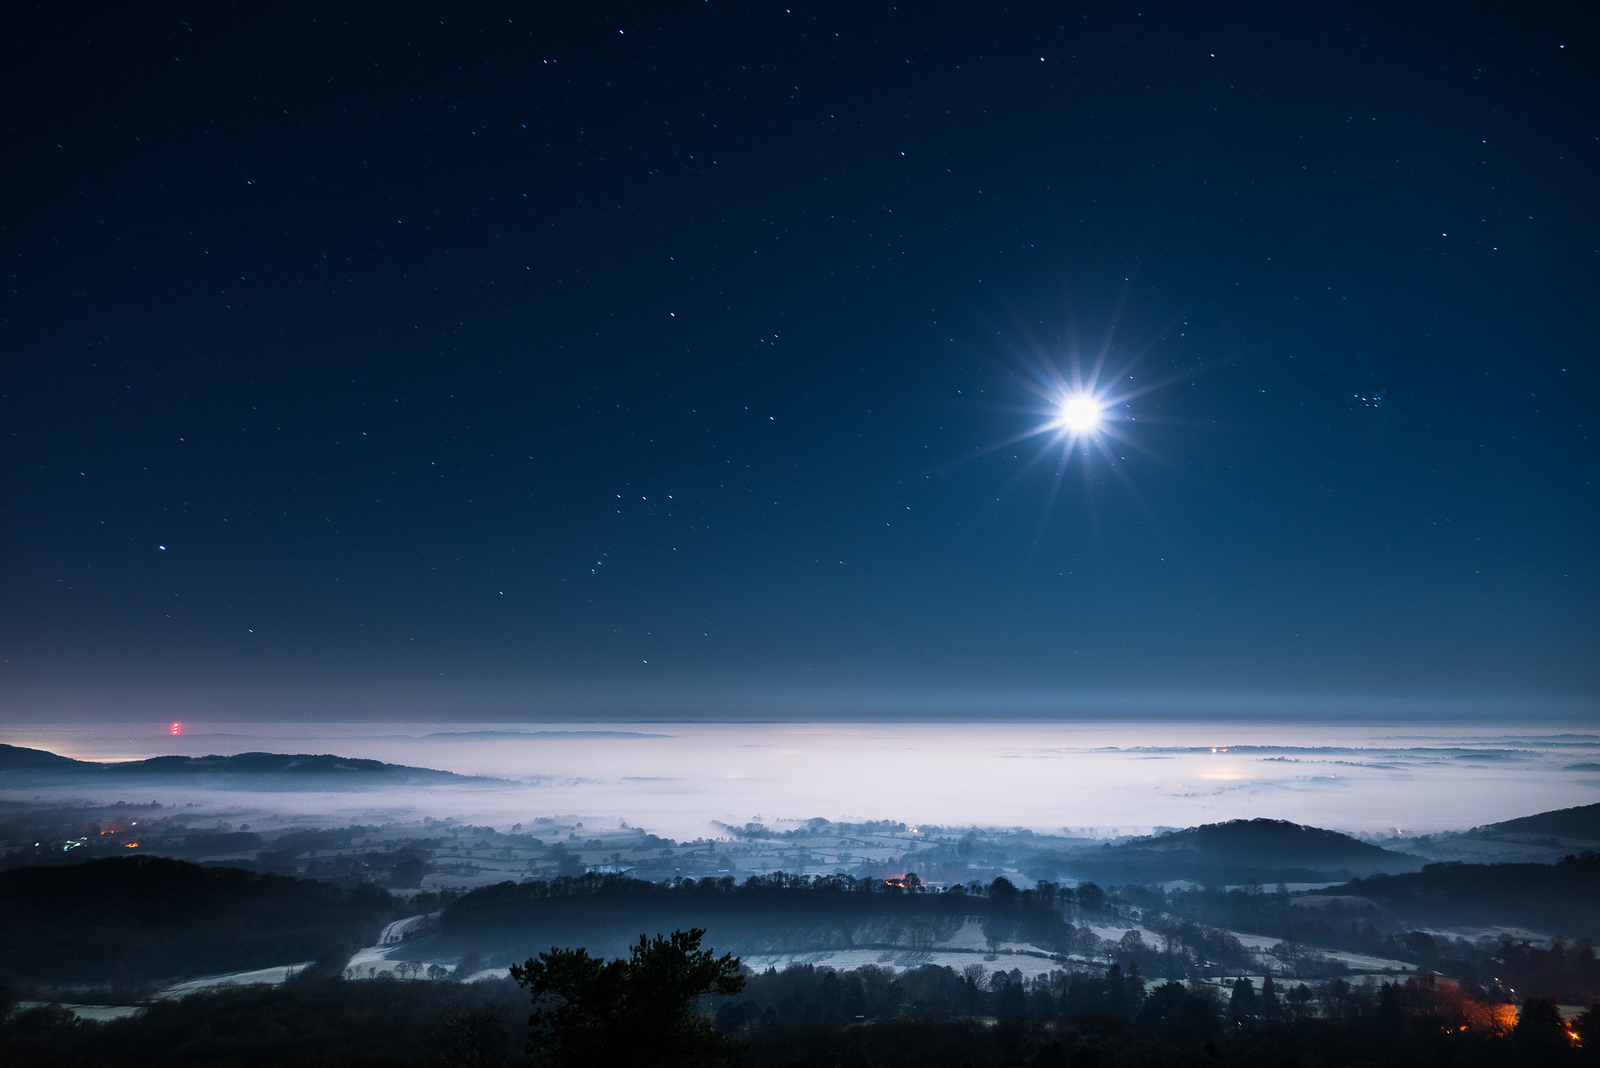 Misty Moonlit night over Malvern HIlls